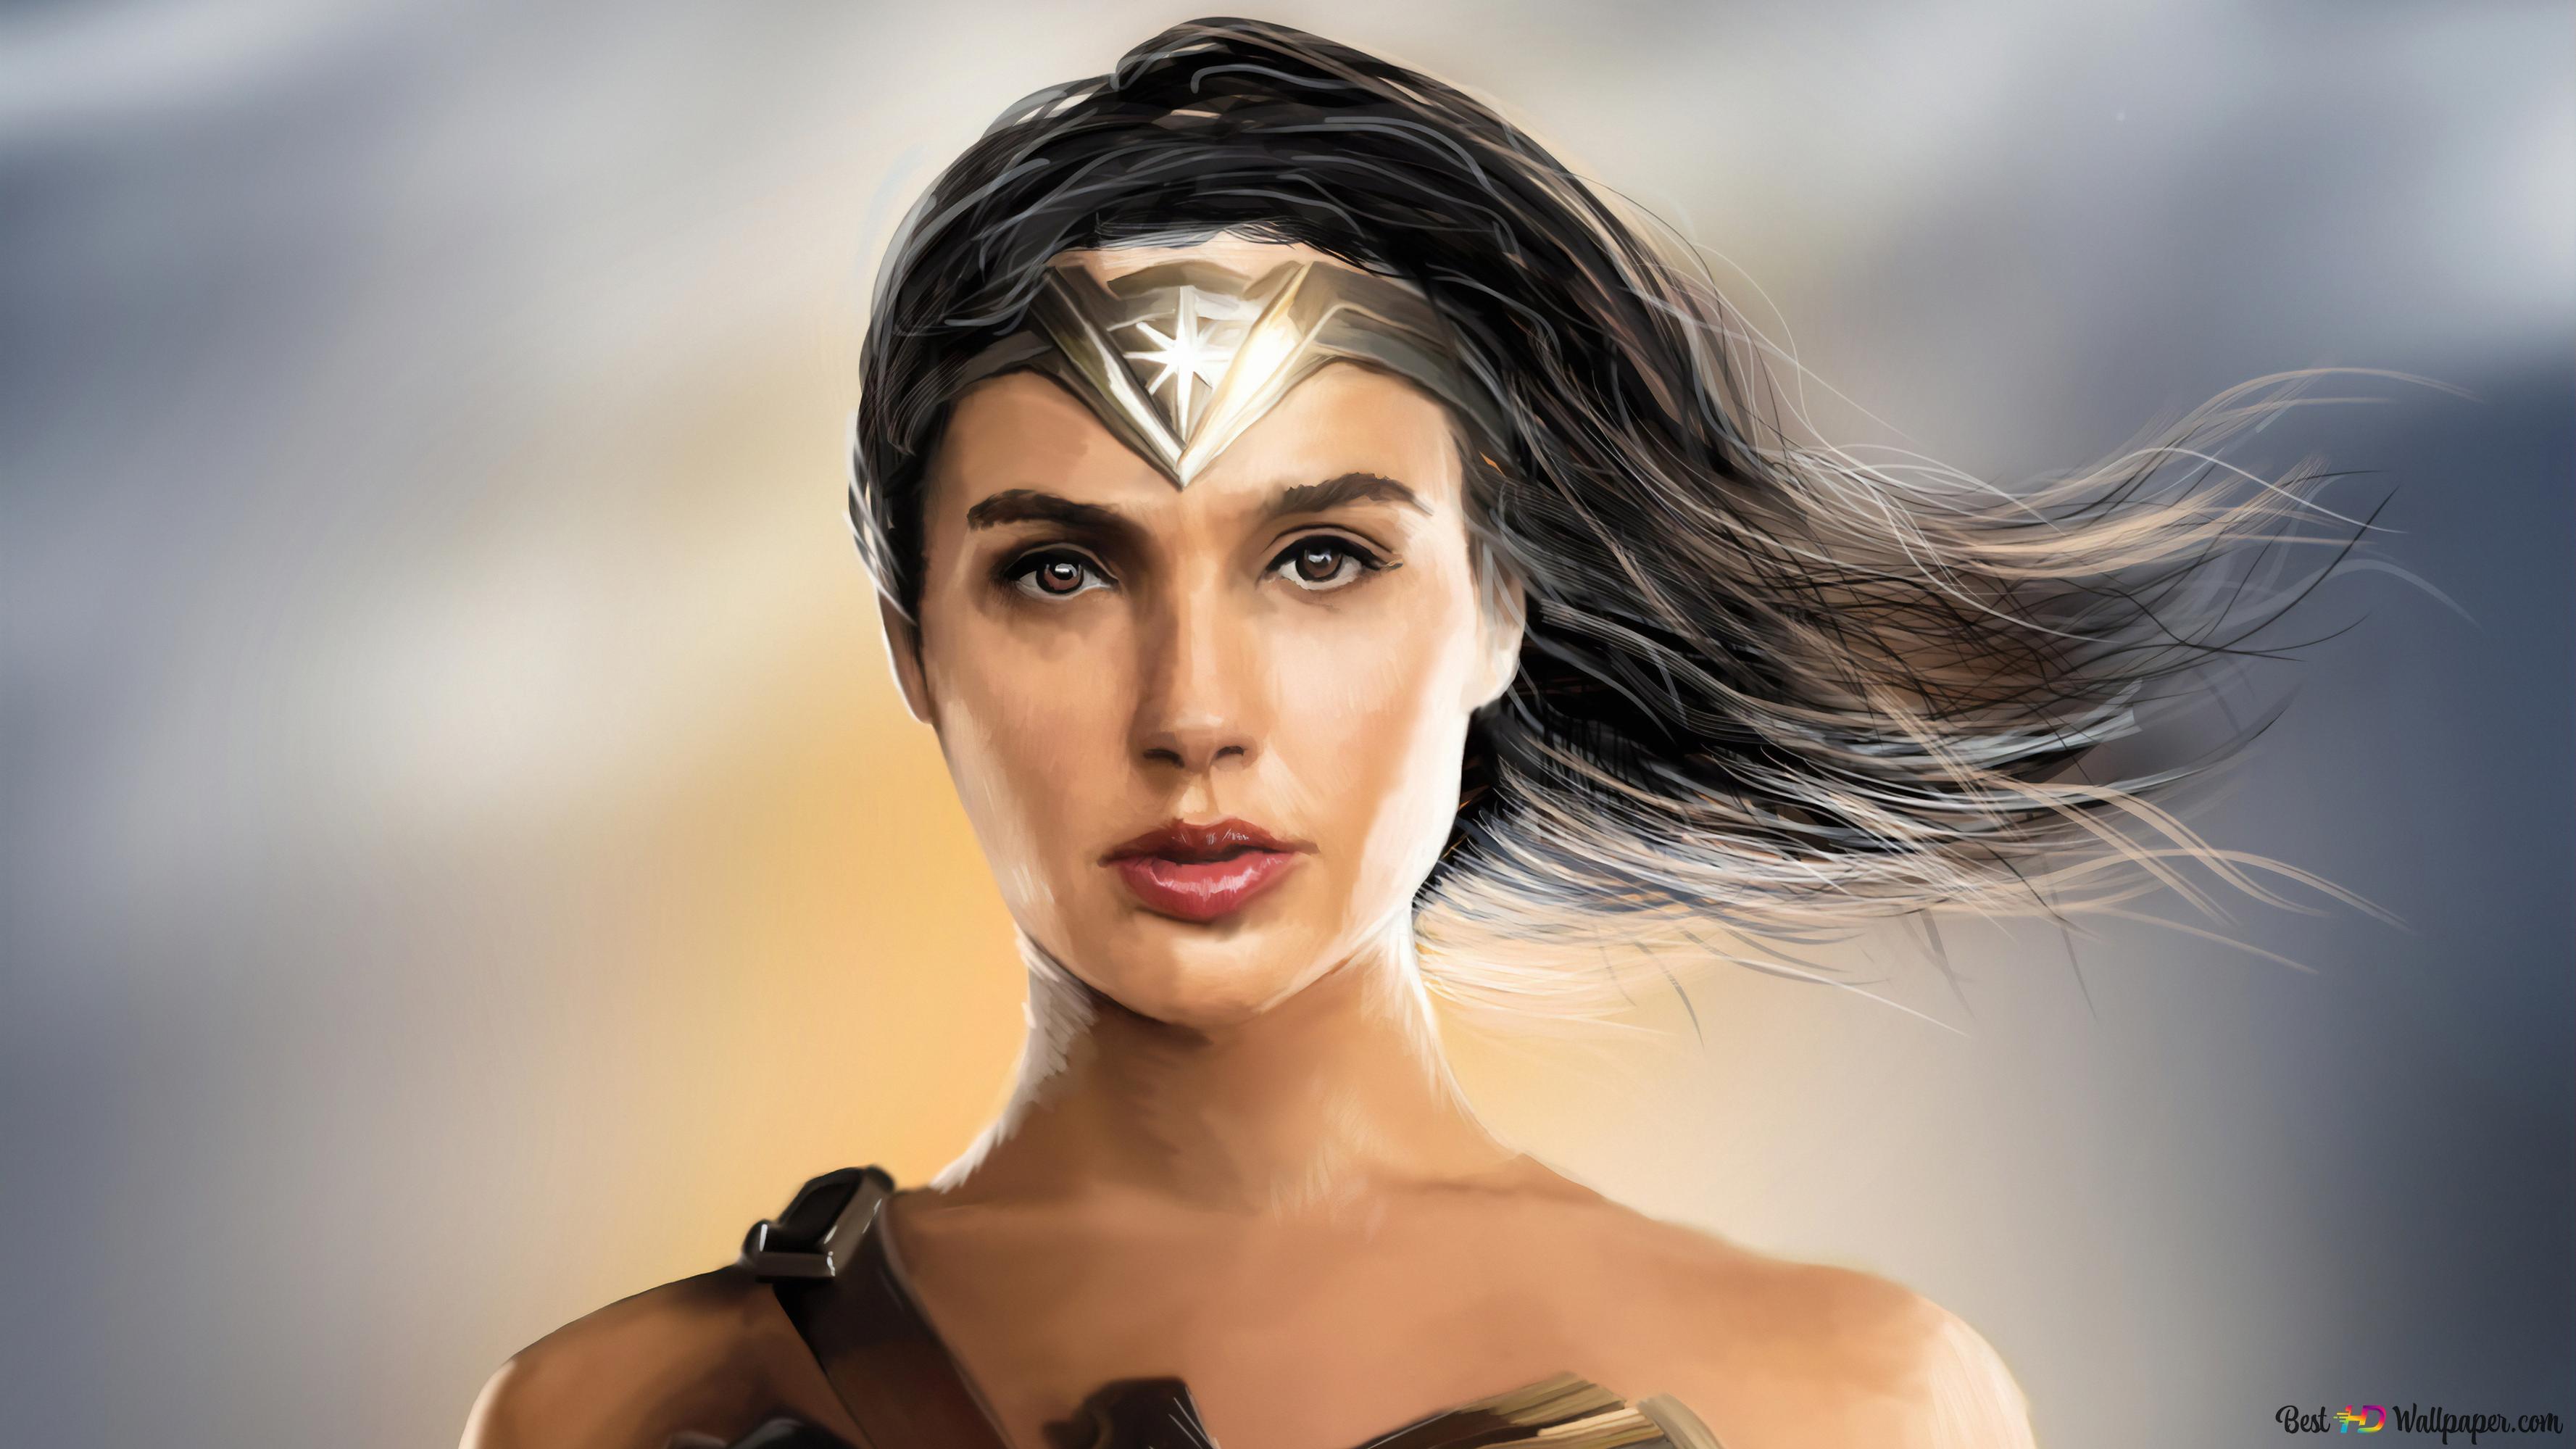 Gal Gadot Is Wonder Woman Hd Wallpaper Download